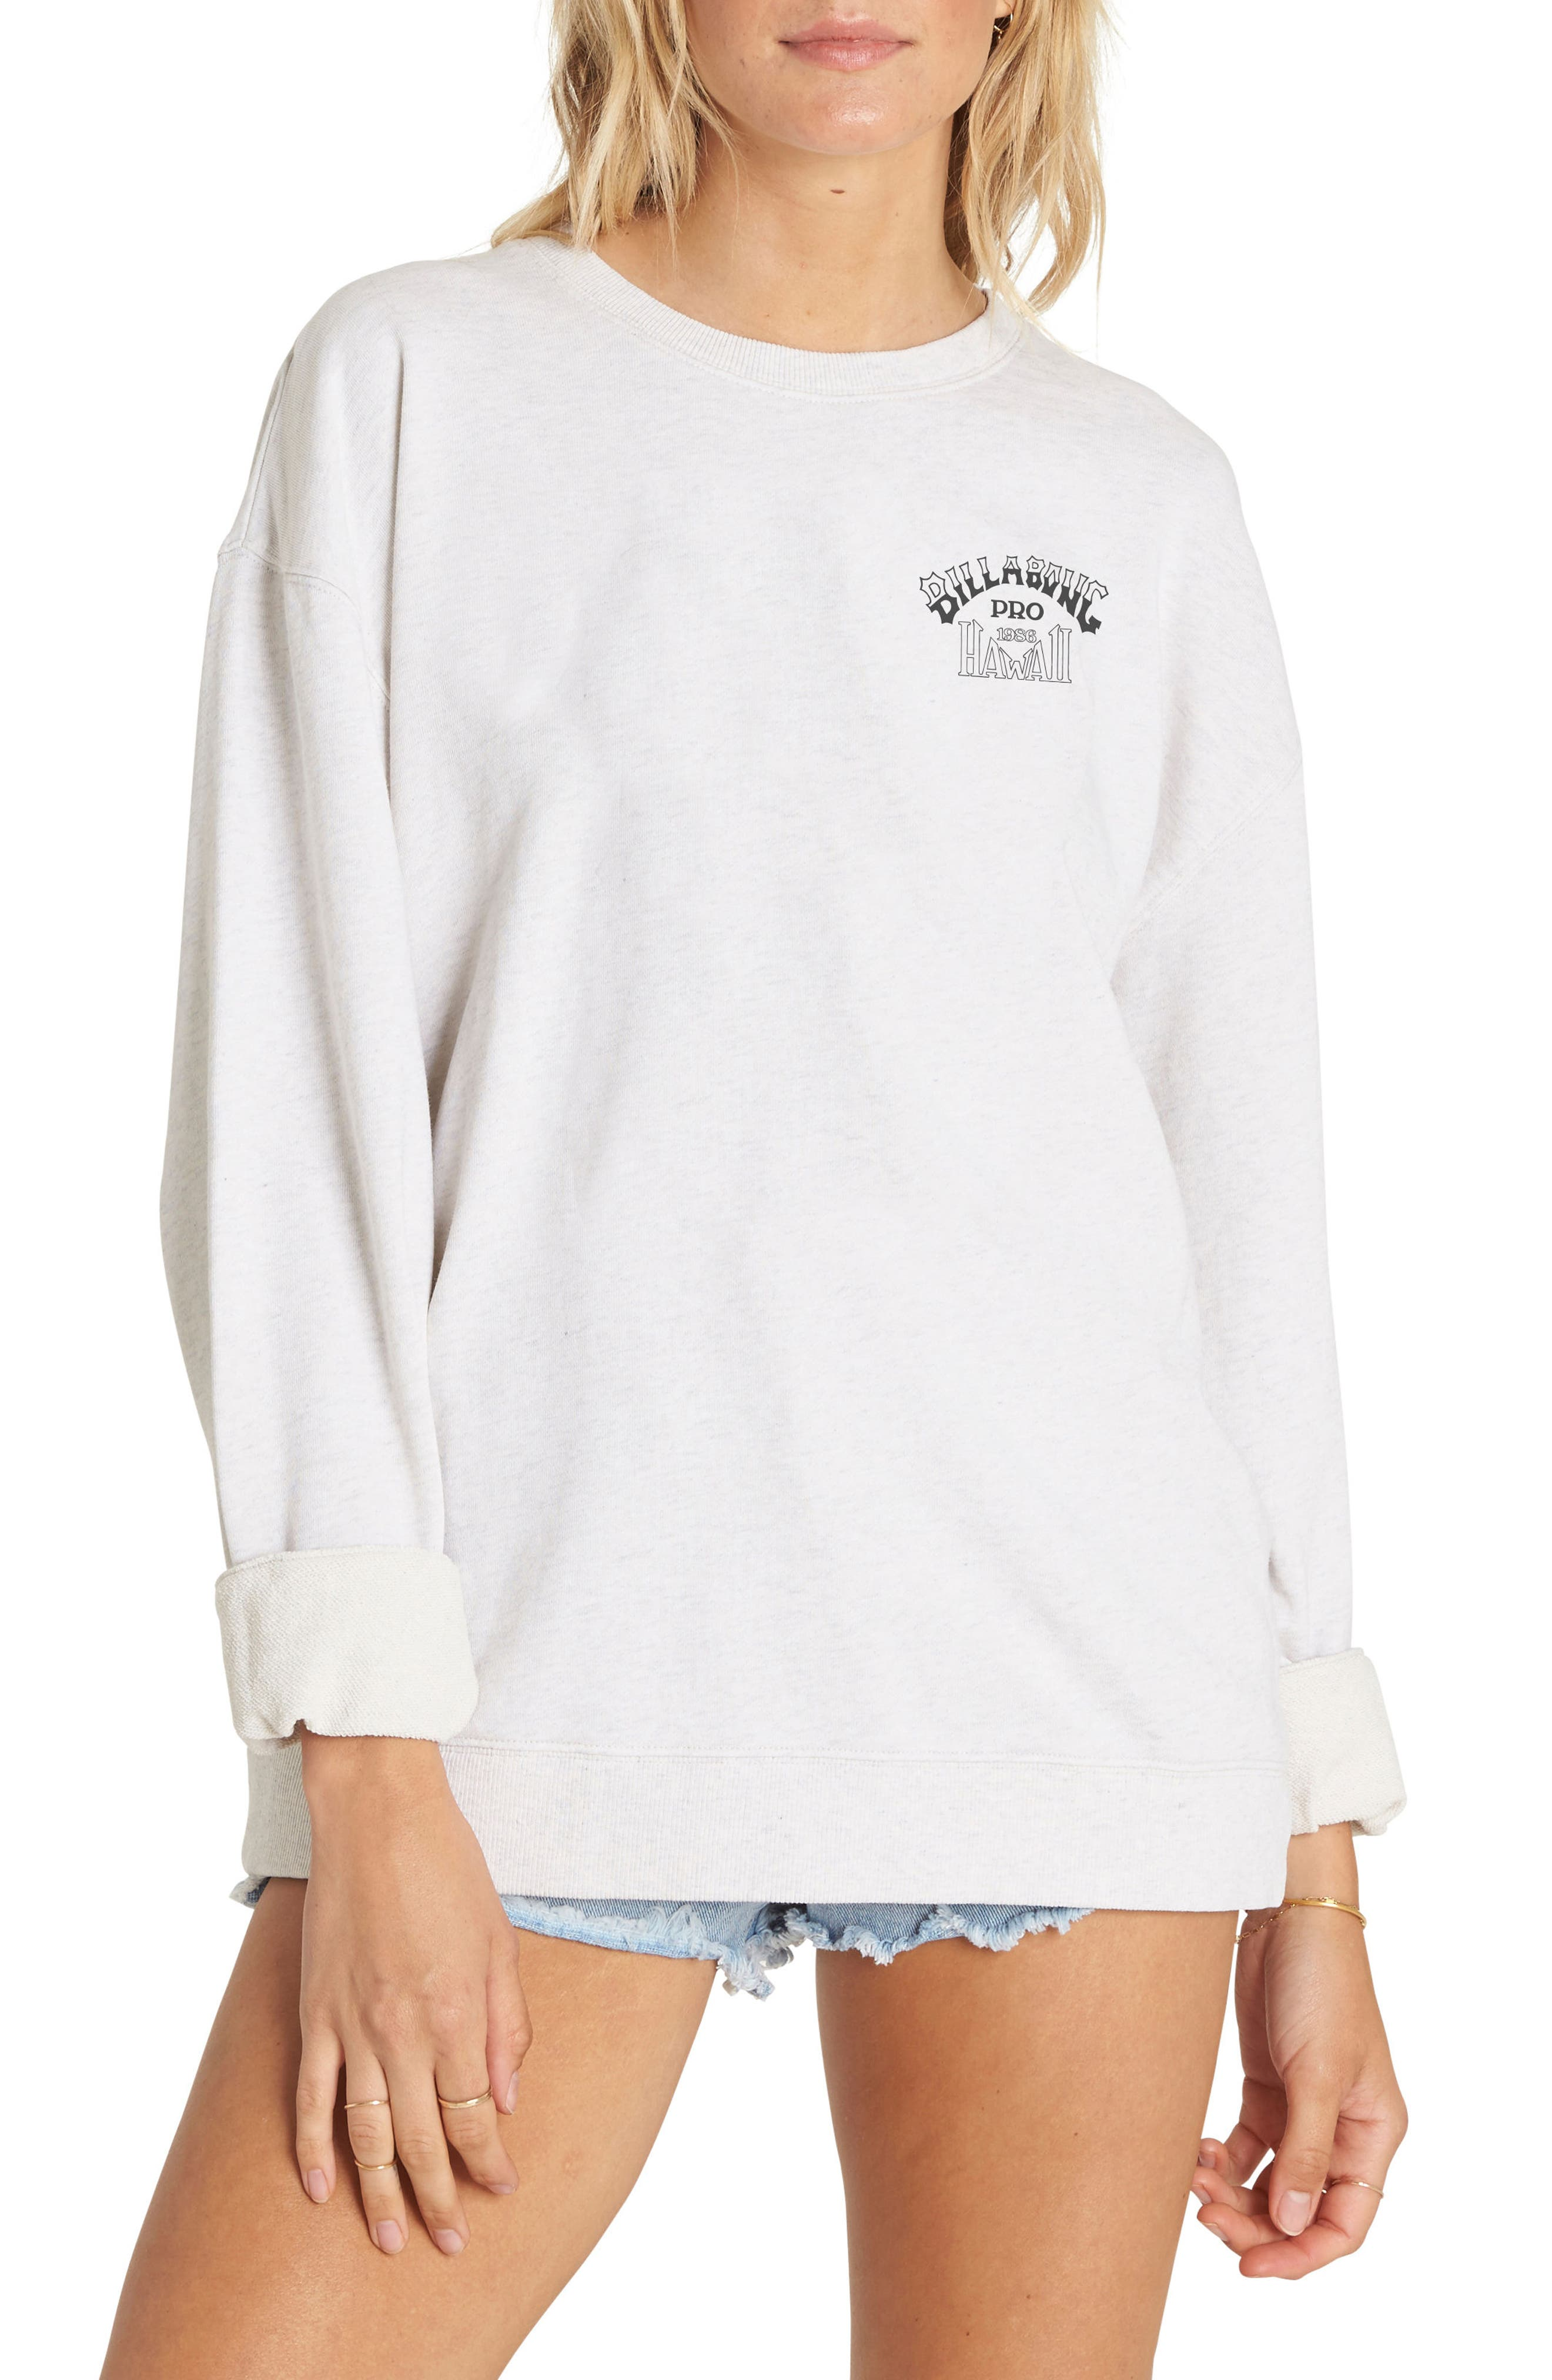 Main Image - Billabong White Wash Sweatshirt